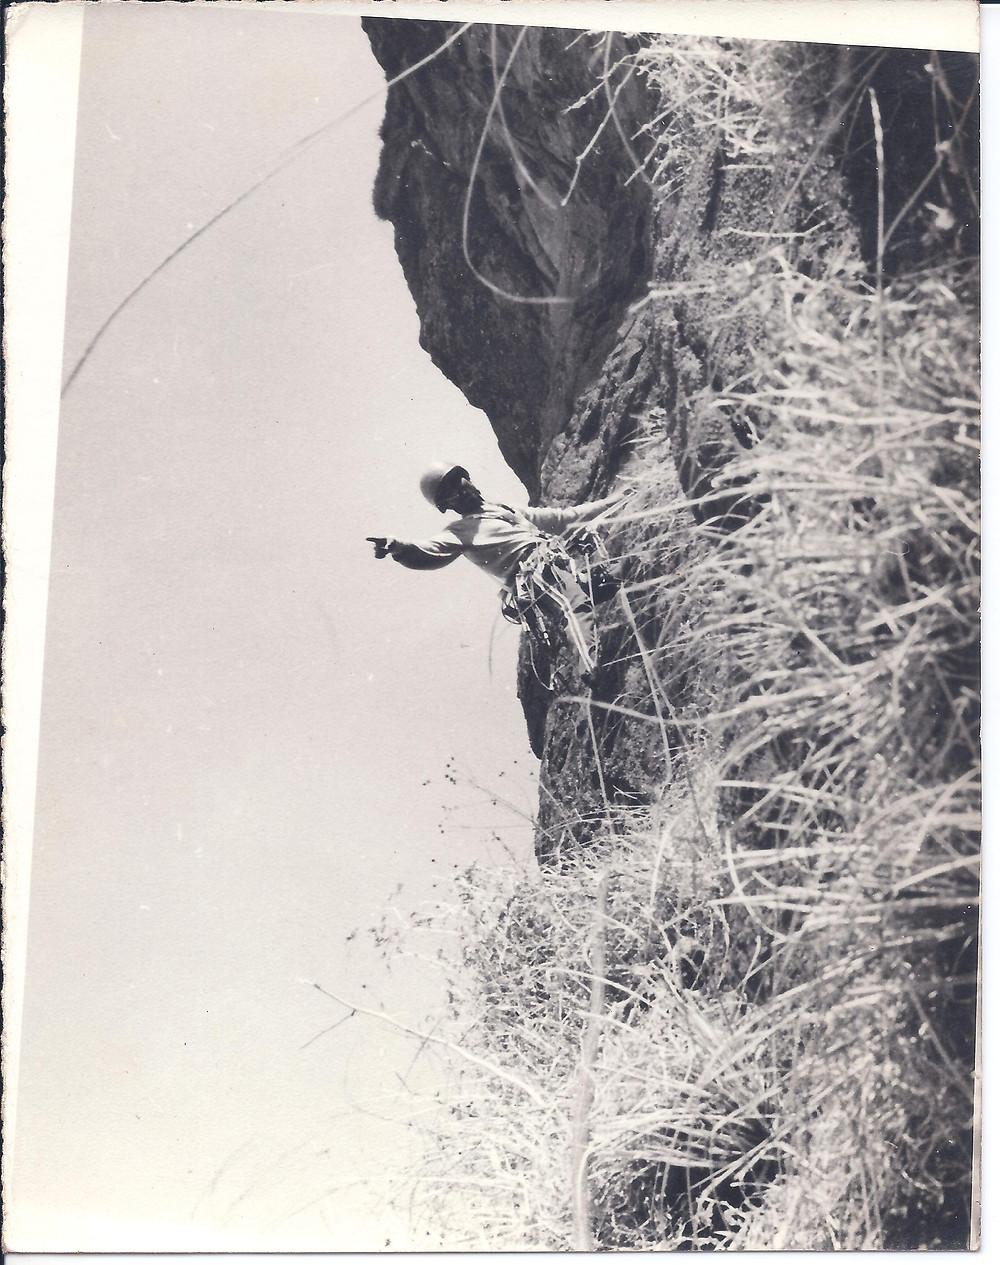 Duke's Nose 800' Climbing Expedition - April 1985